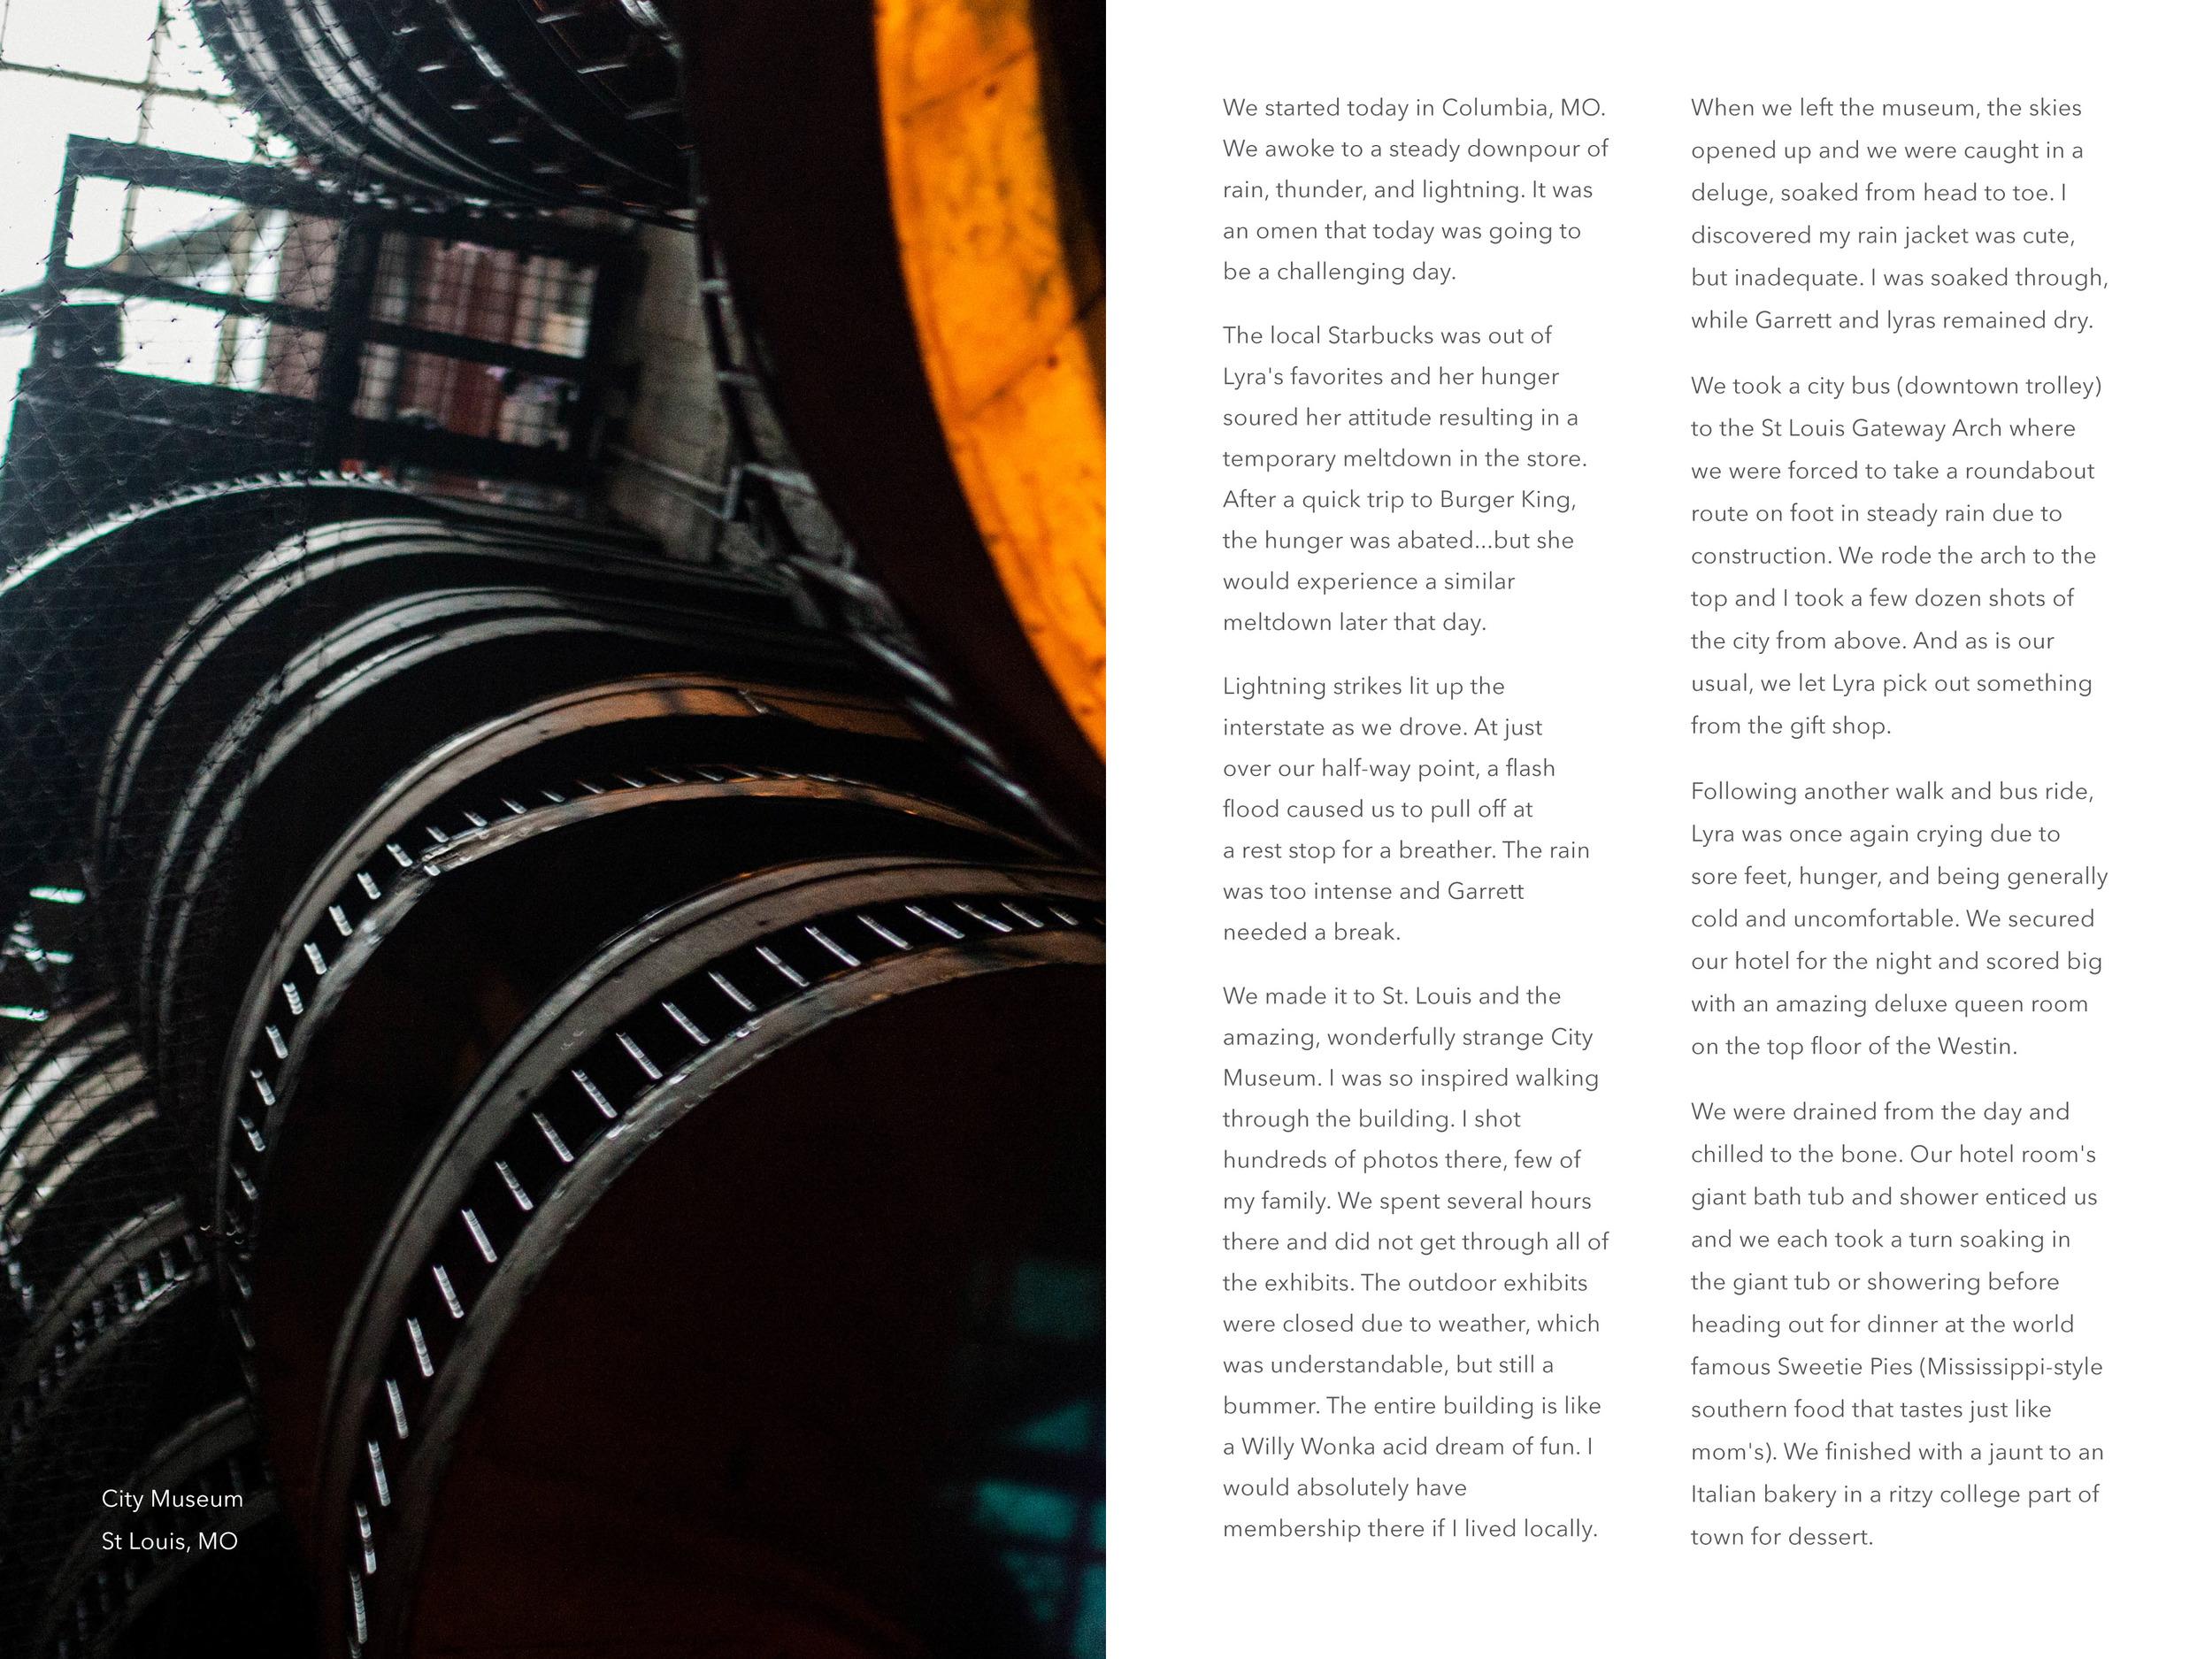 The City Museum 6x8 photobook layout